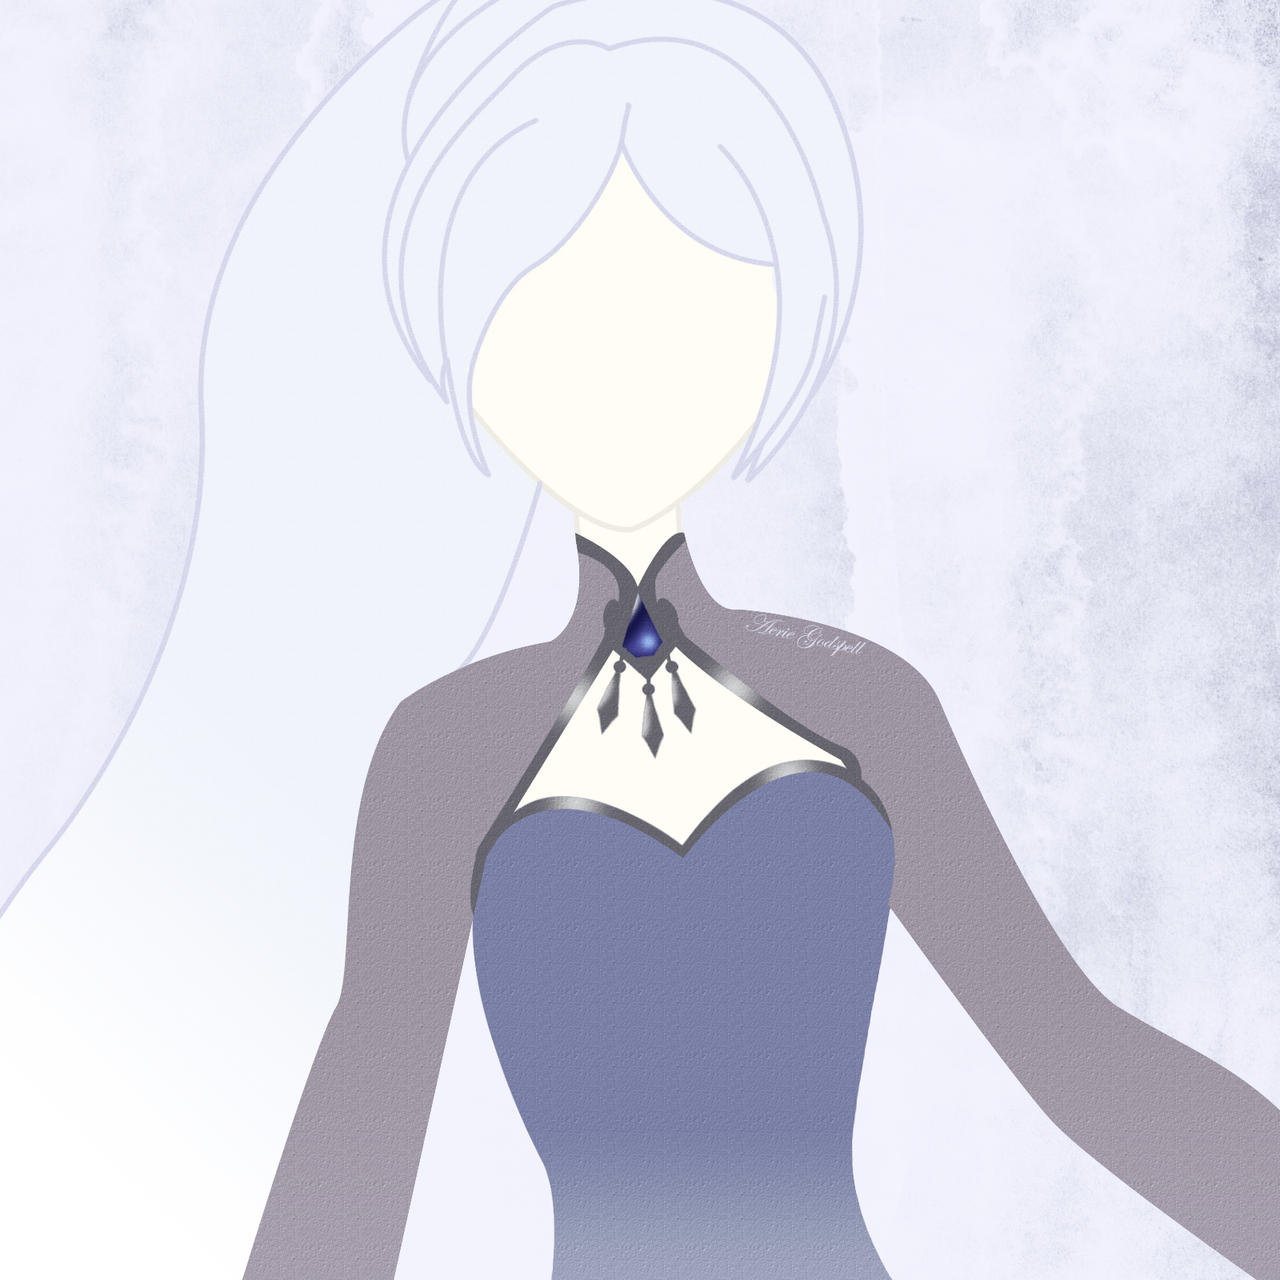 how tall is medaka kurogami